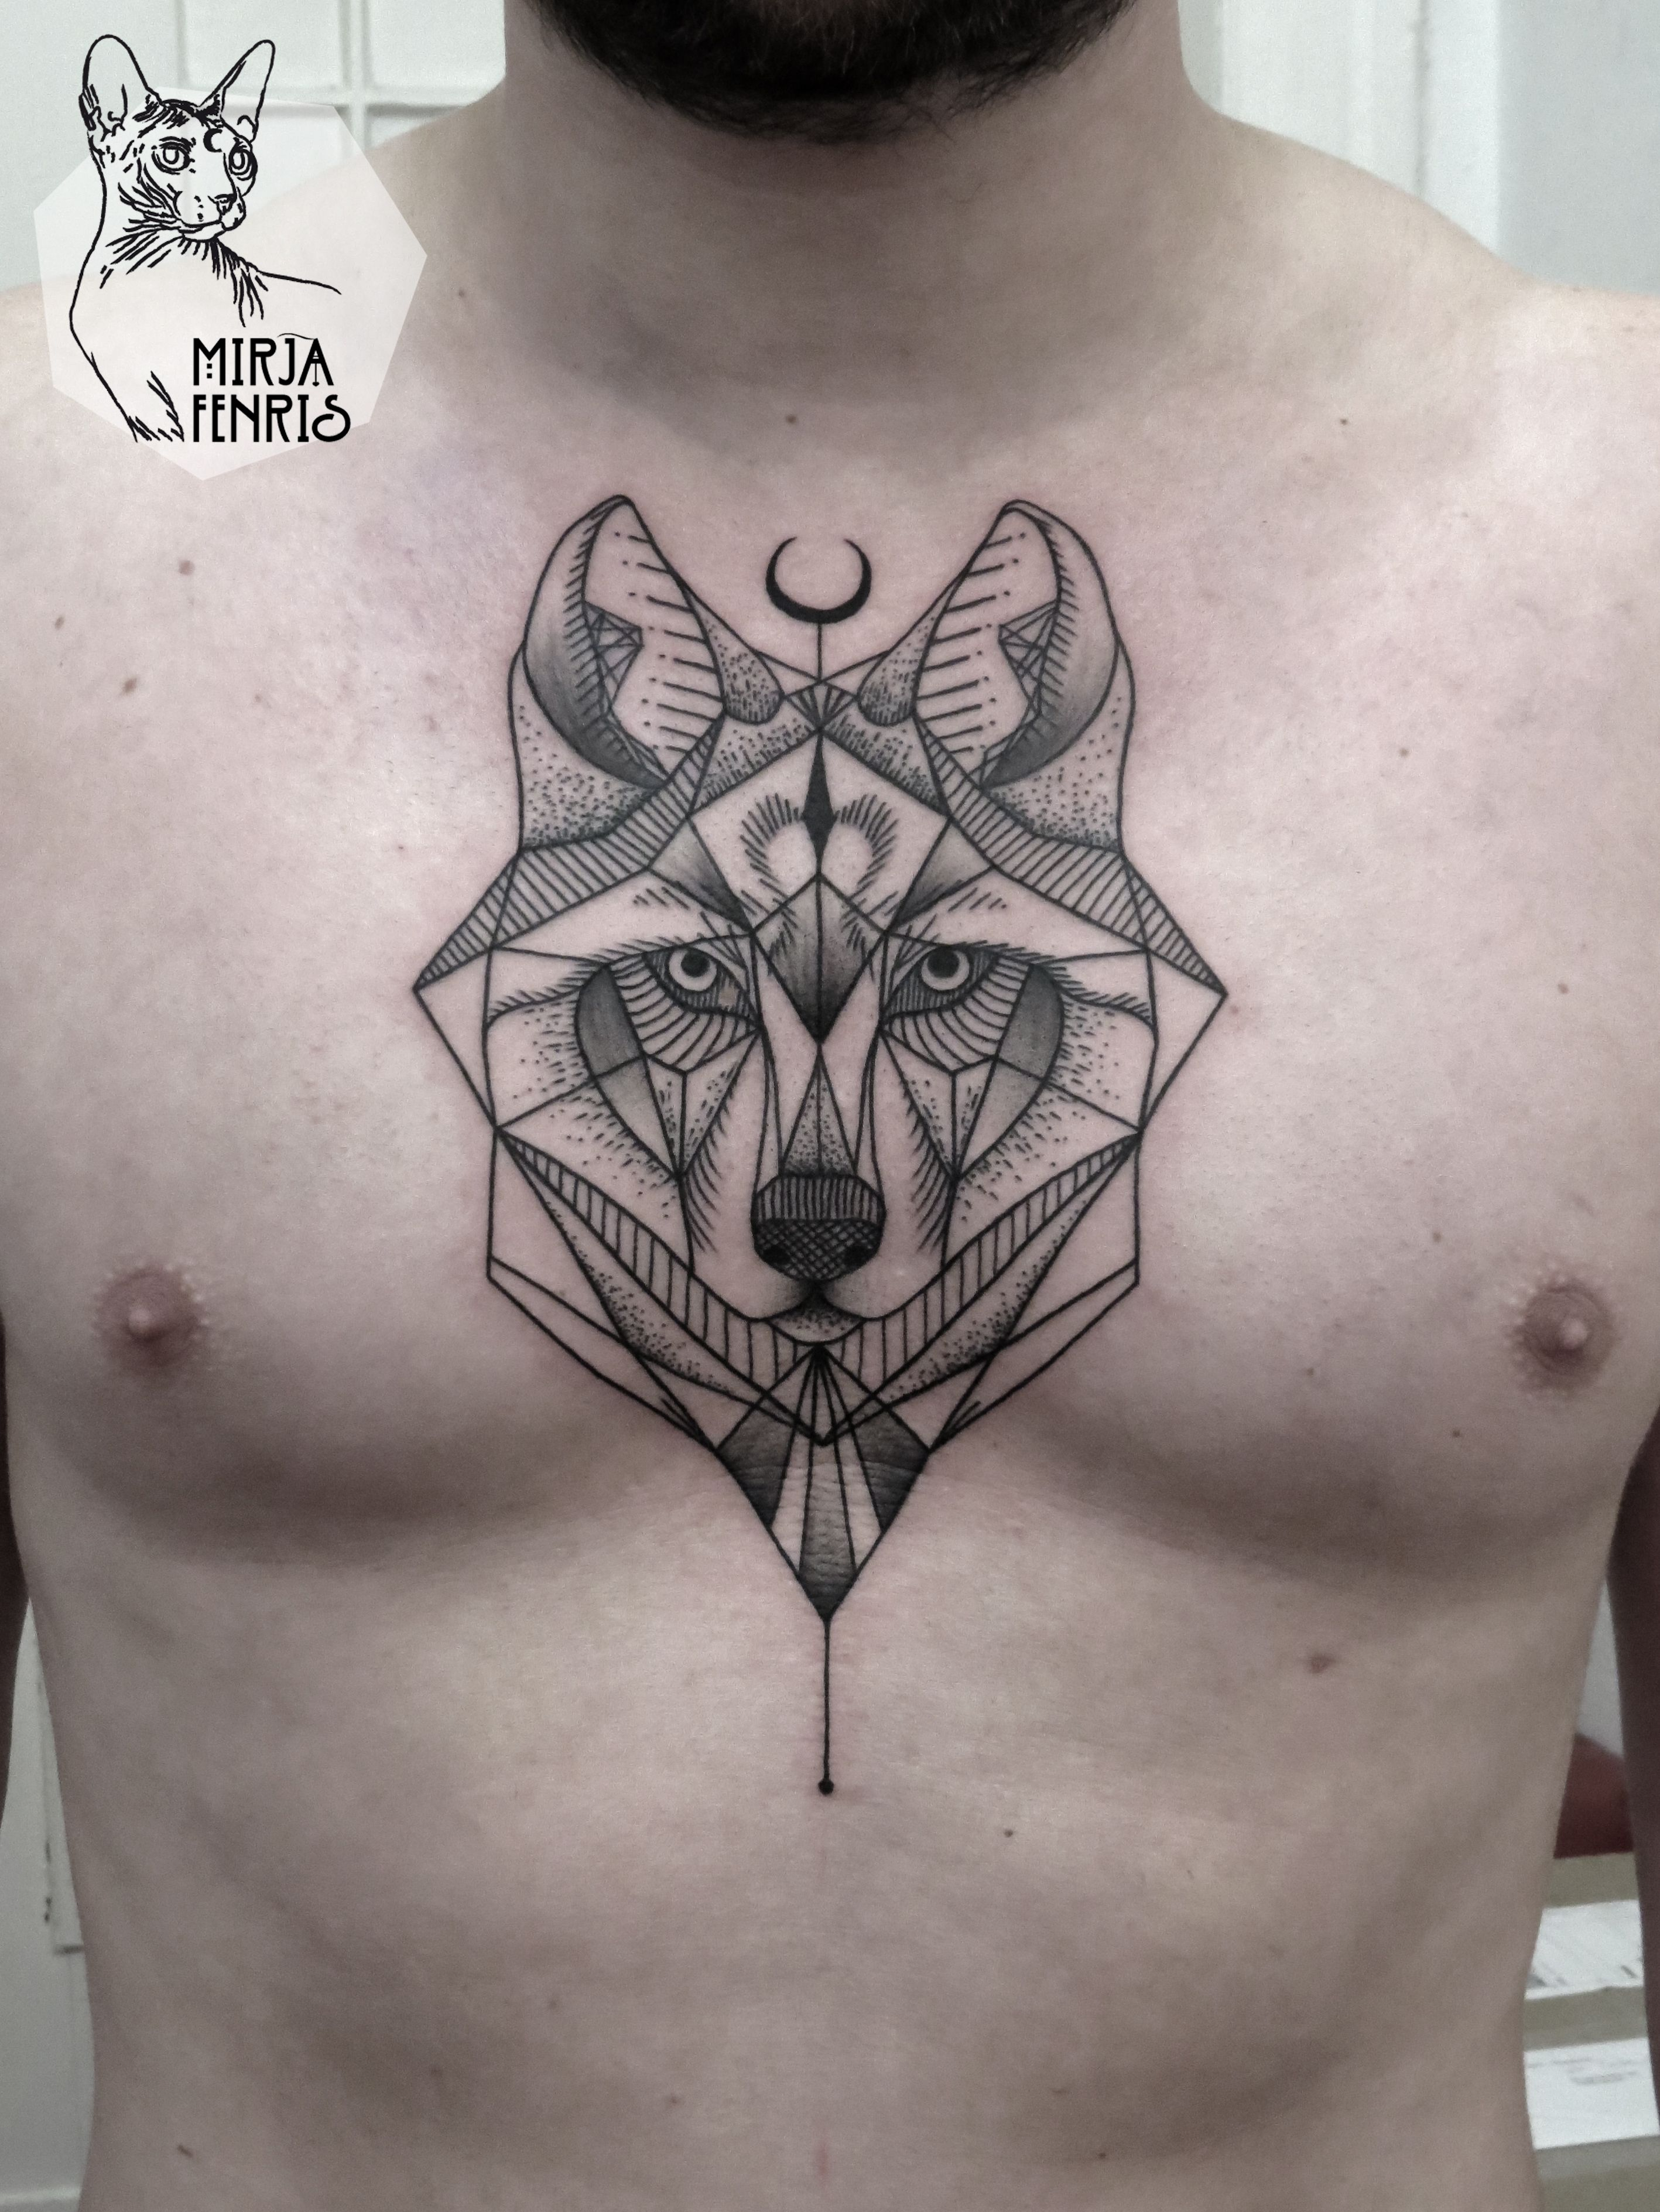 mirja fenris tattoo tattoos tatto. Black Bedroom Furniture Sets. Home Design Ideas